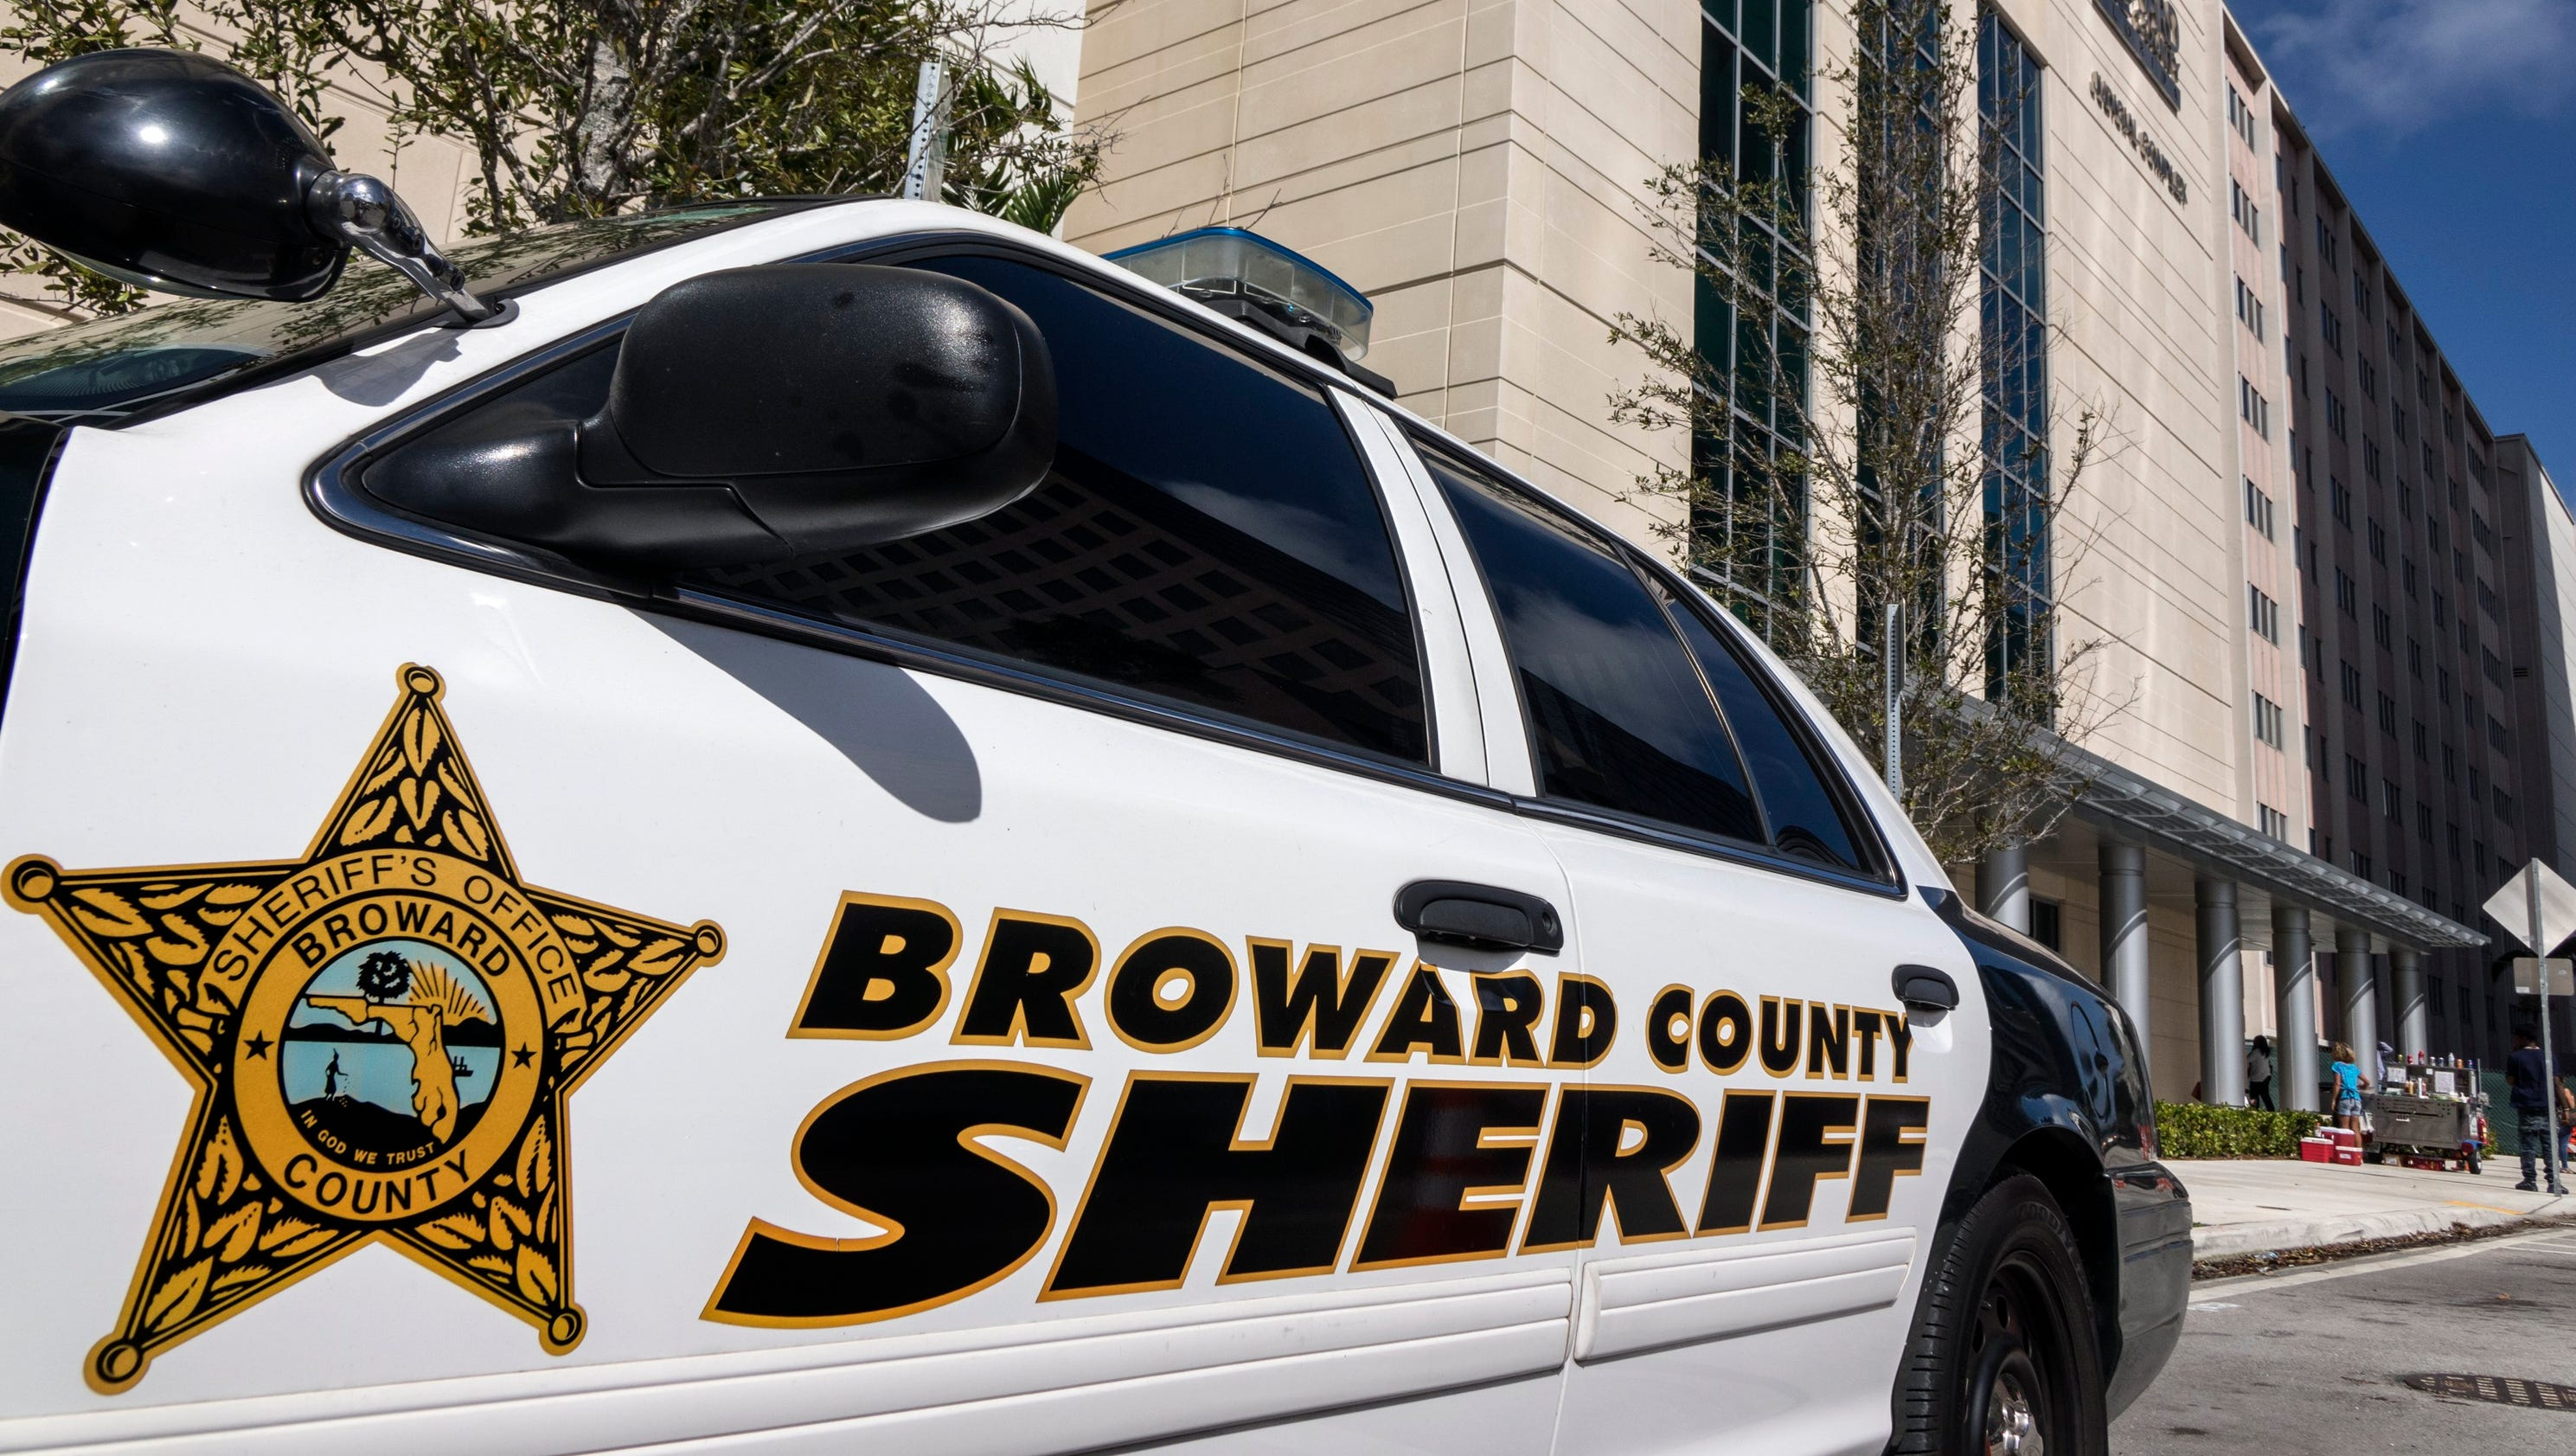 Home | Broward Sheriff's Office